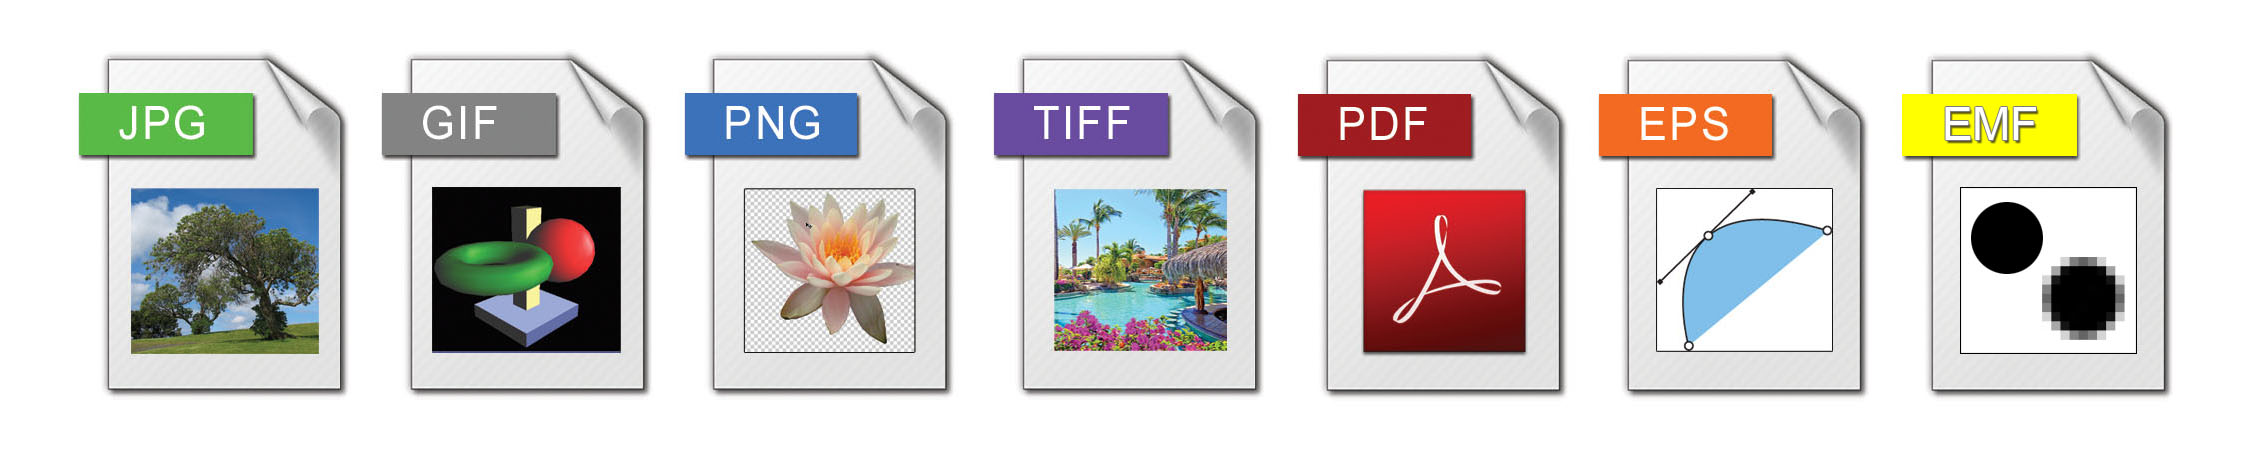 Barcode Image File Formats - Bar Code Graphics